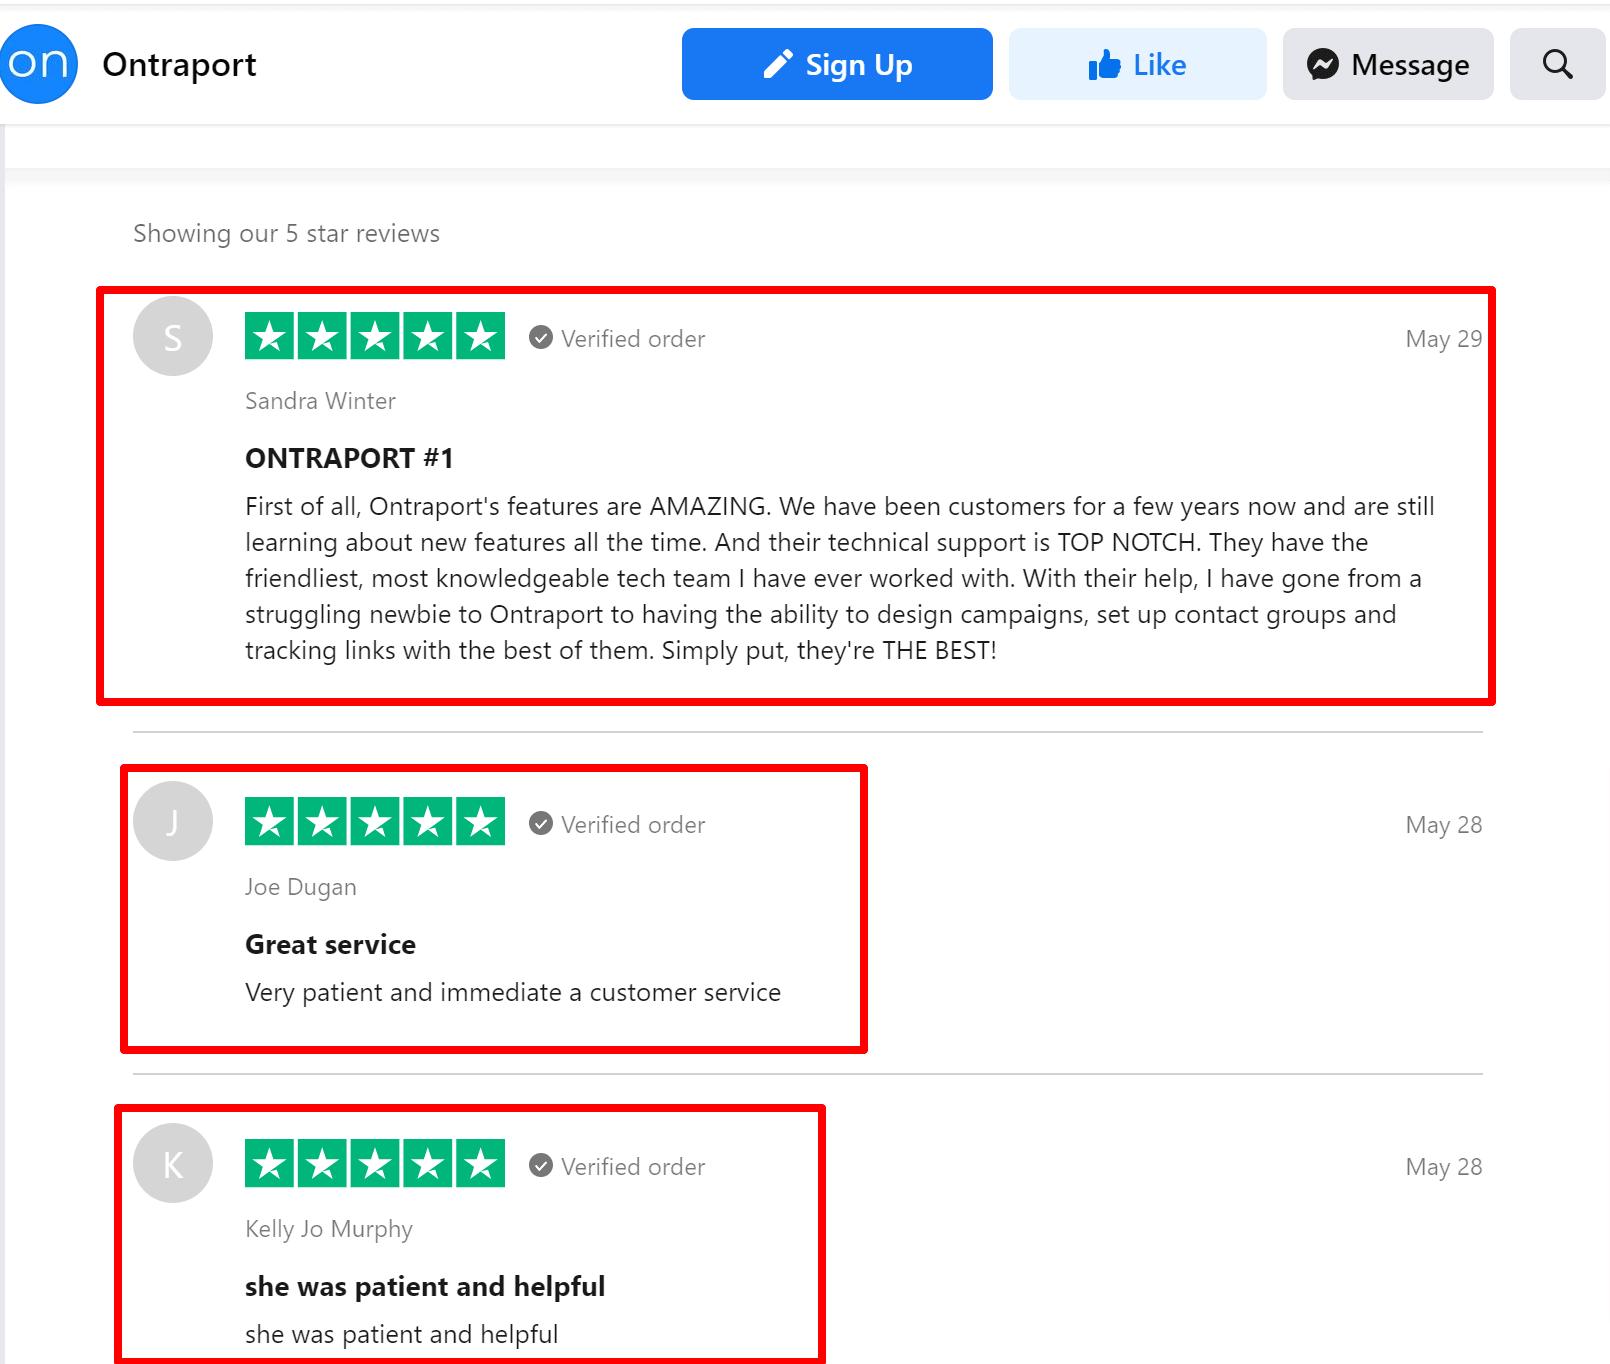 Ontraport Trustpilot Reviews Facebook online 2